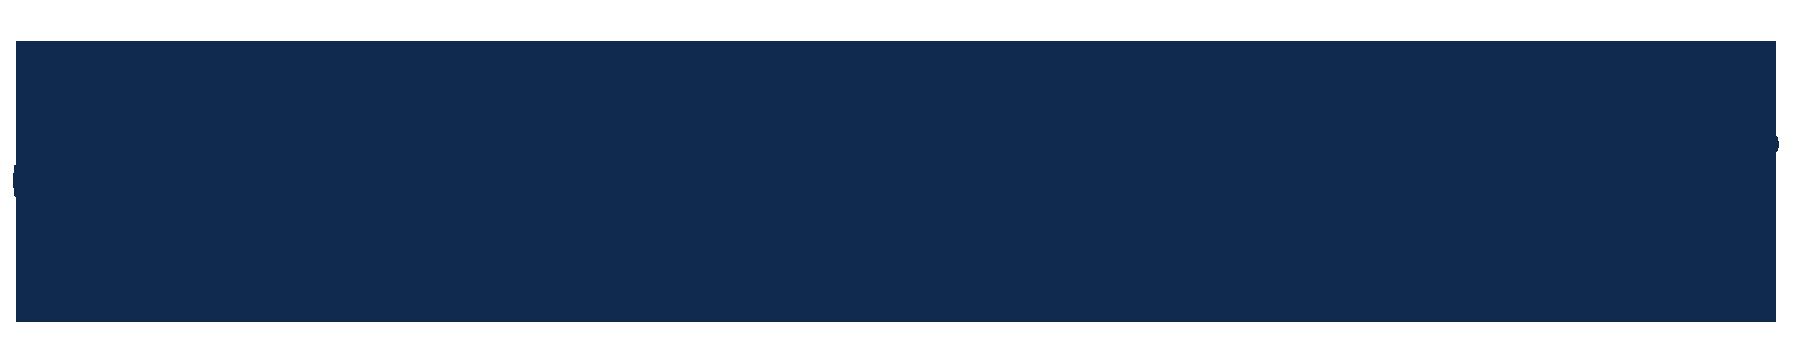 FordPass Rewards Visa Card